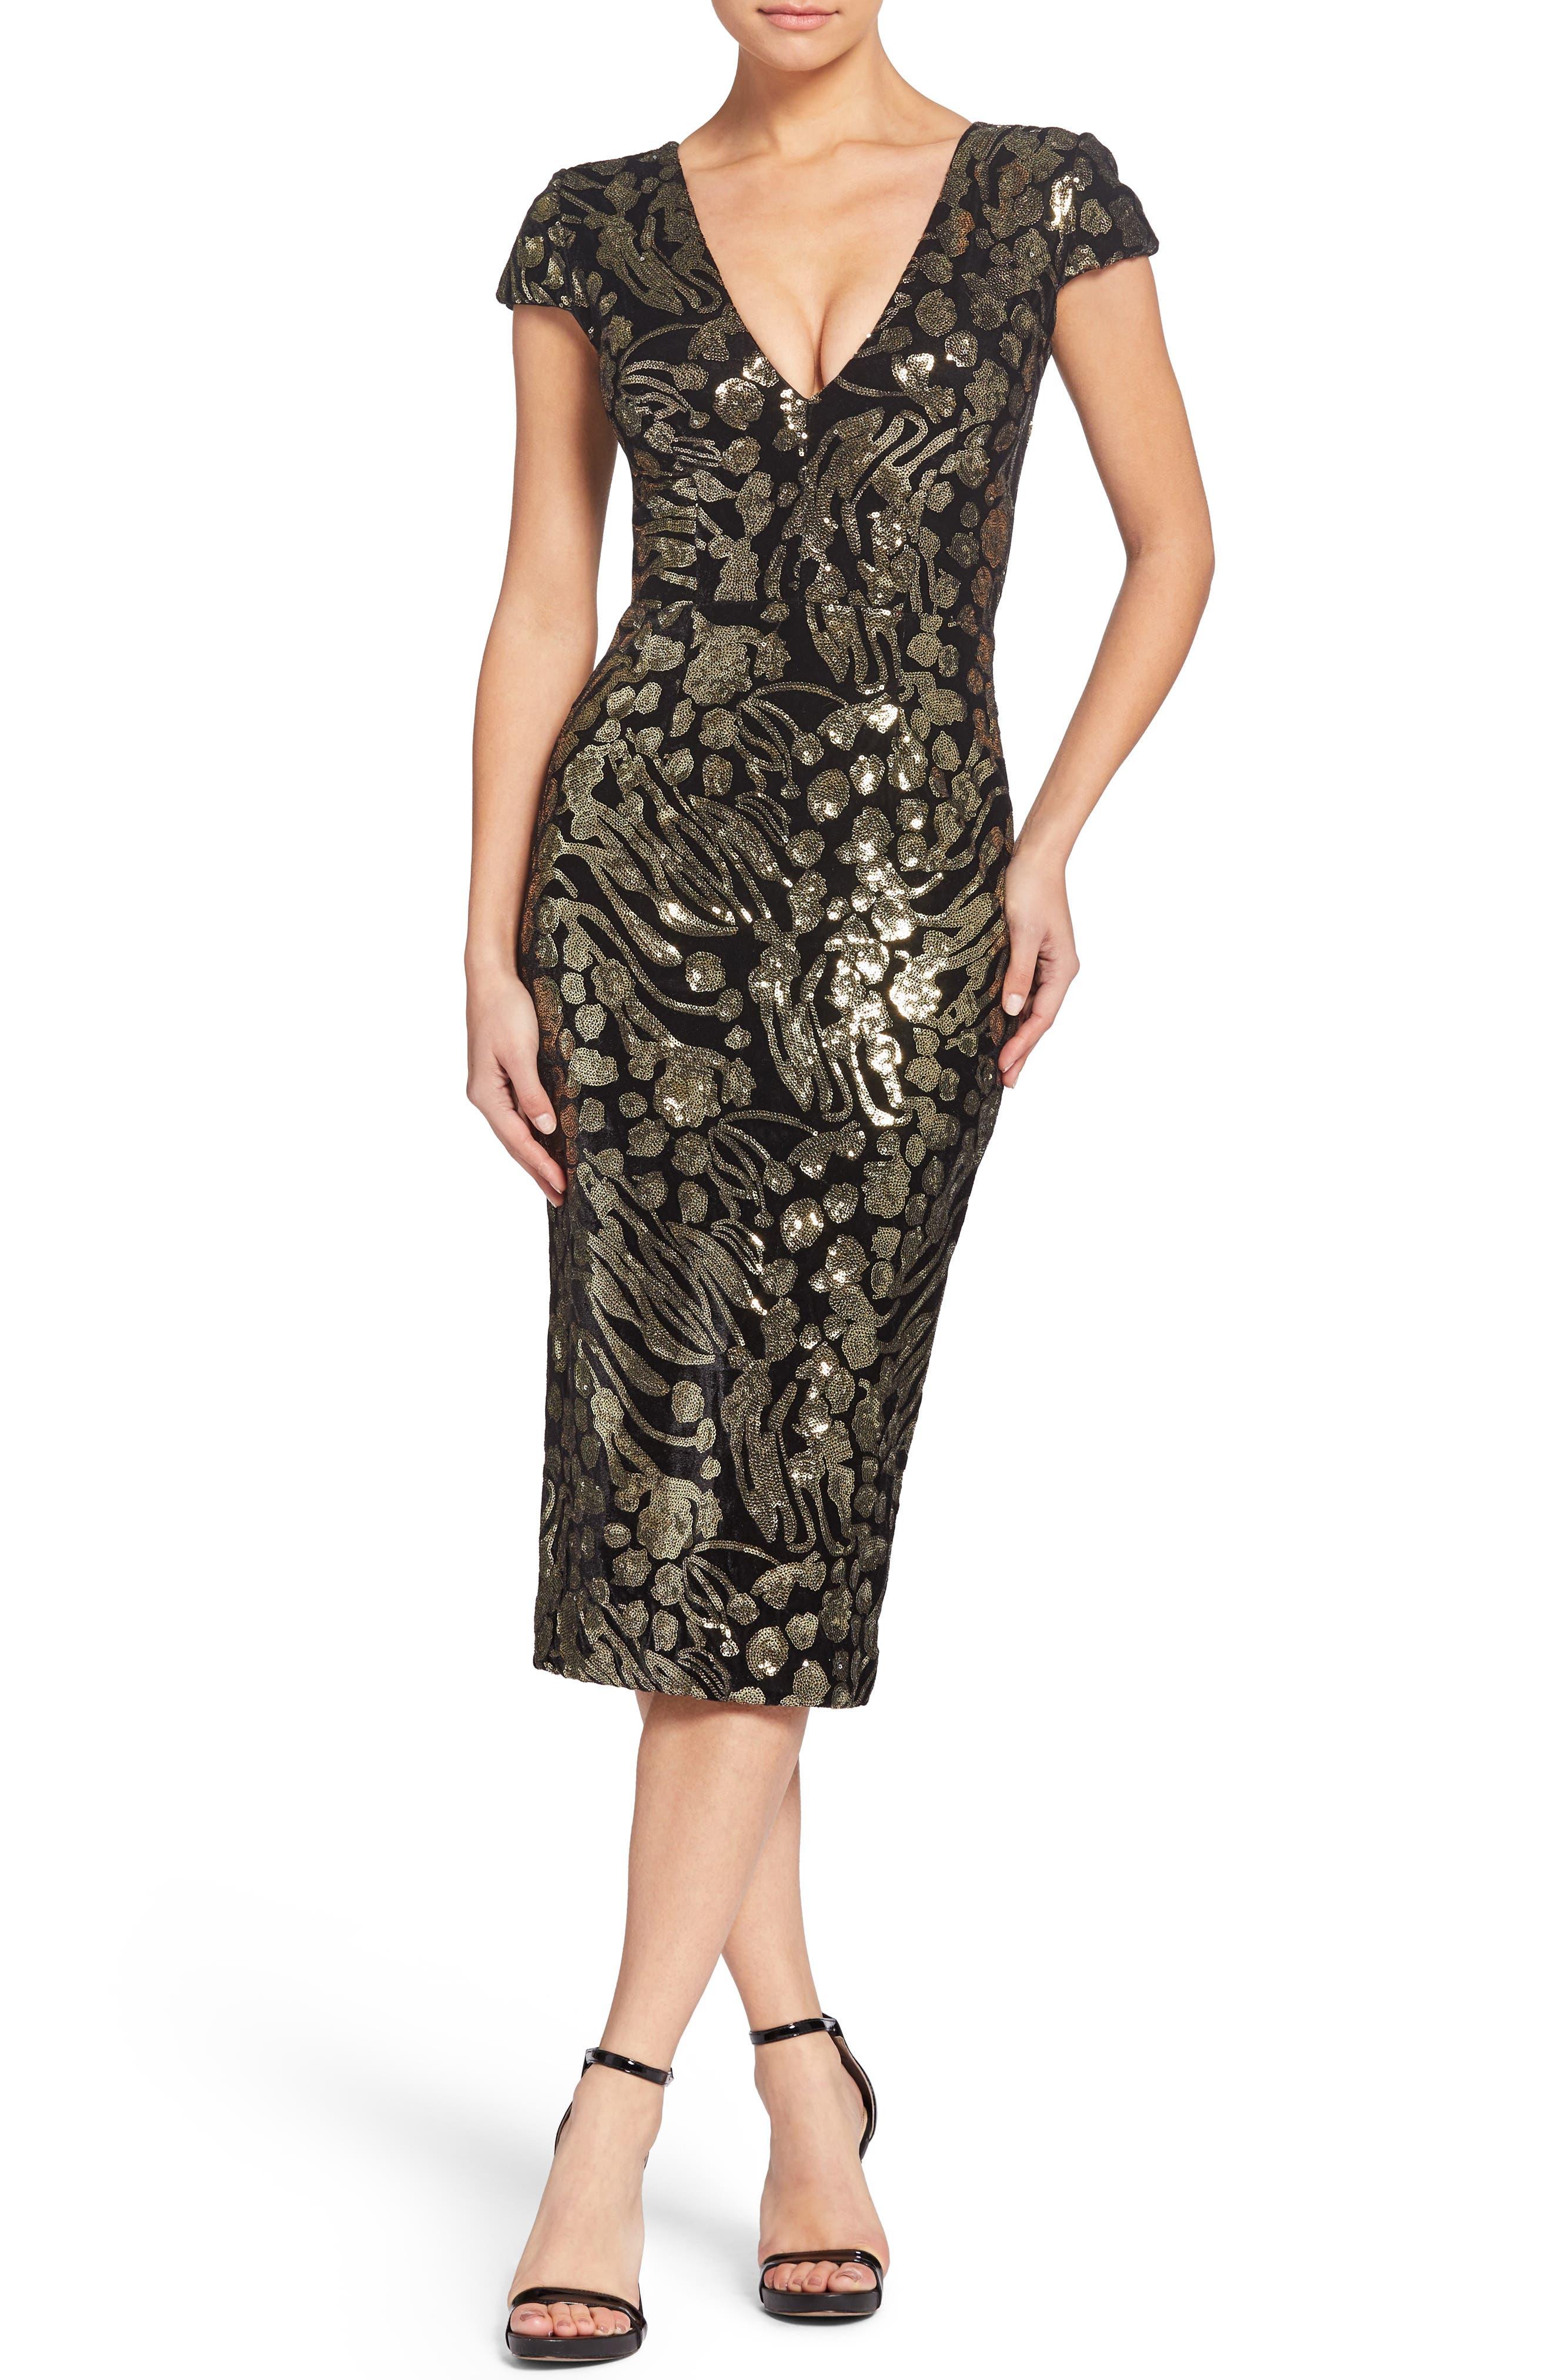 DRESS THE POPULATION Allison Abstract Floral & Velvet Dress in Black/ Gold